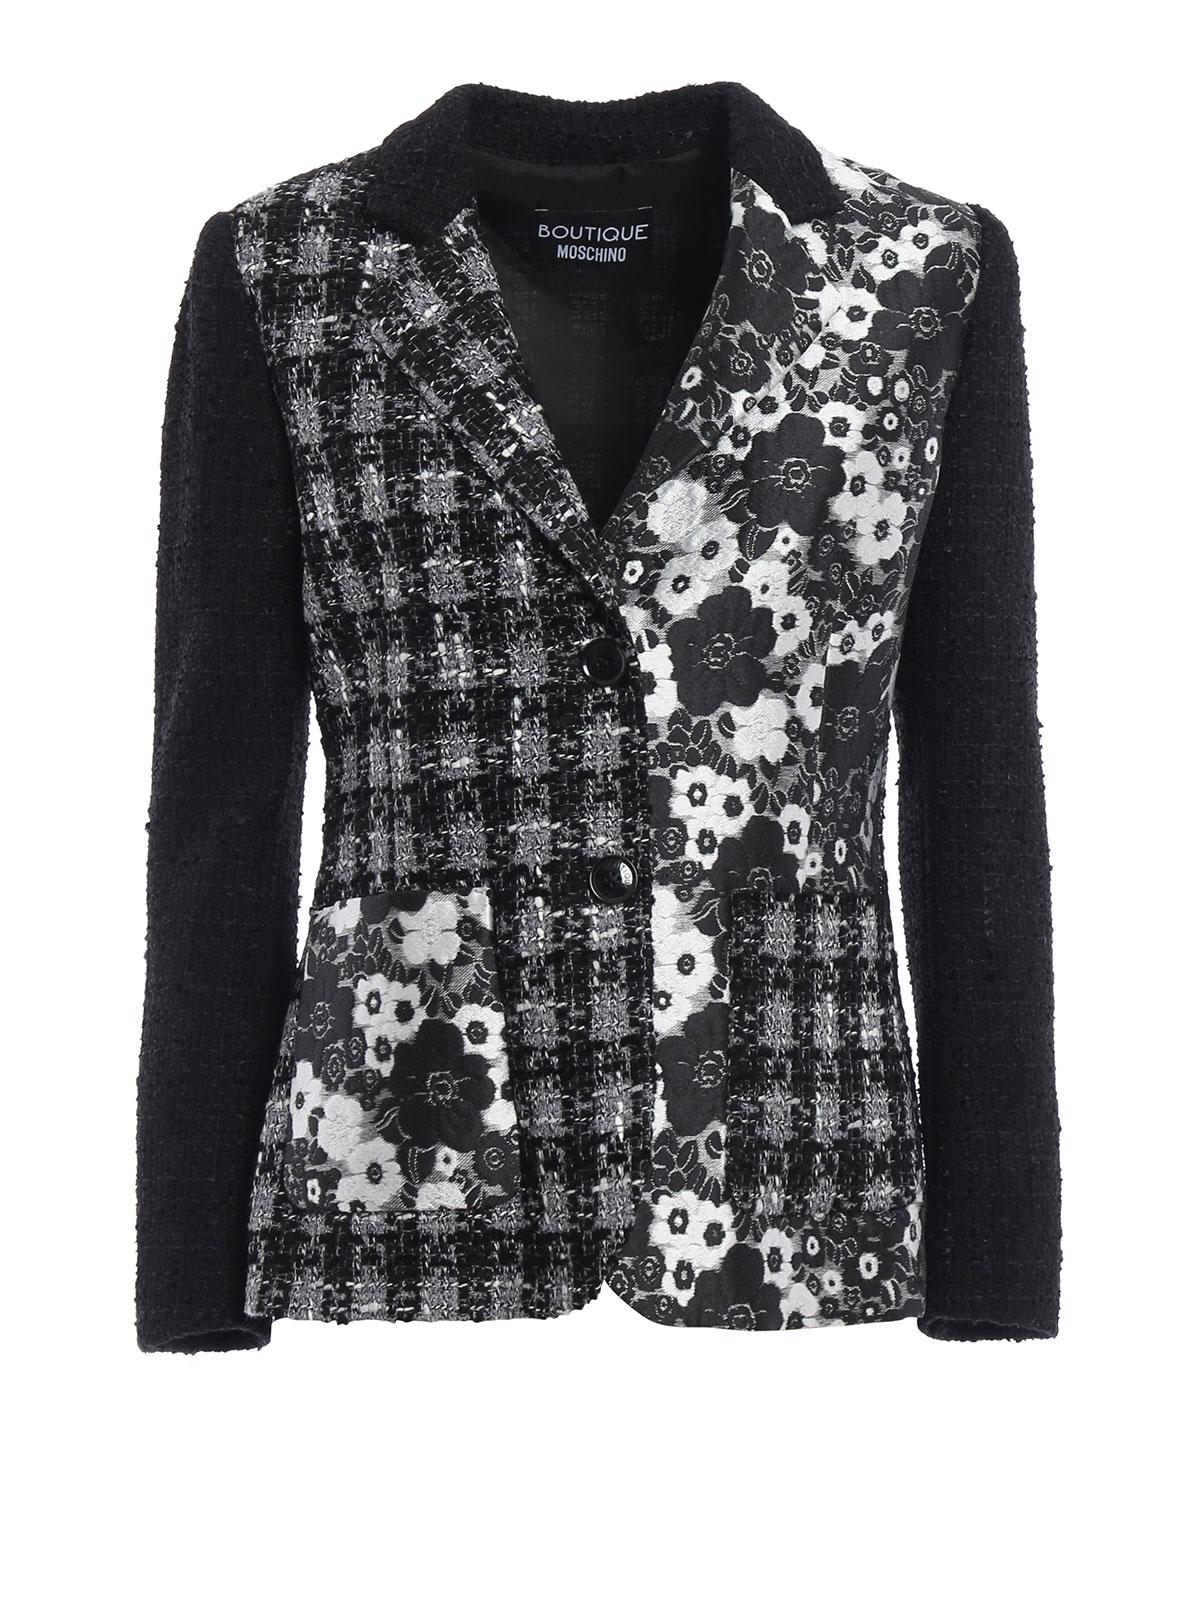 Donna Giacca Moschino Giacca Giacca Tweed Tweed Moschino Donna nNPk80wXO